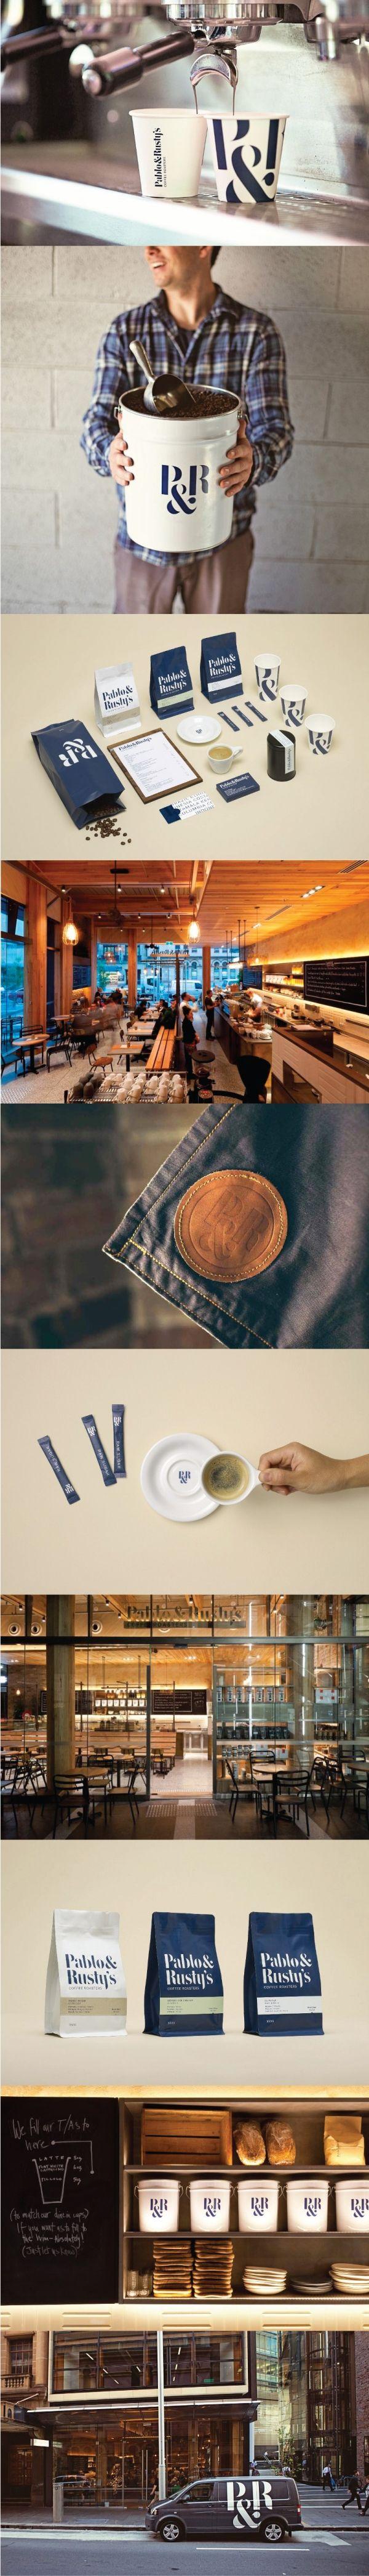 Pablo & Rusty's. Despite taste, this is the best looking coffee brand. #branding #identity #design